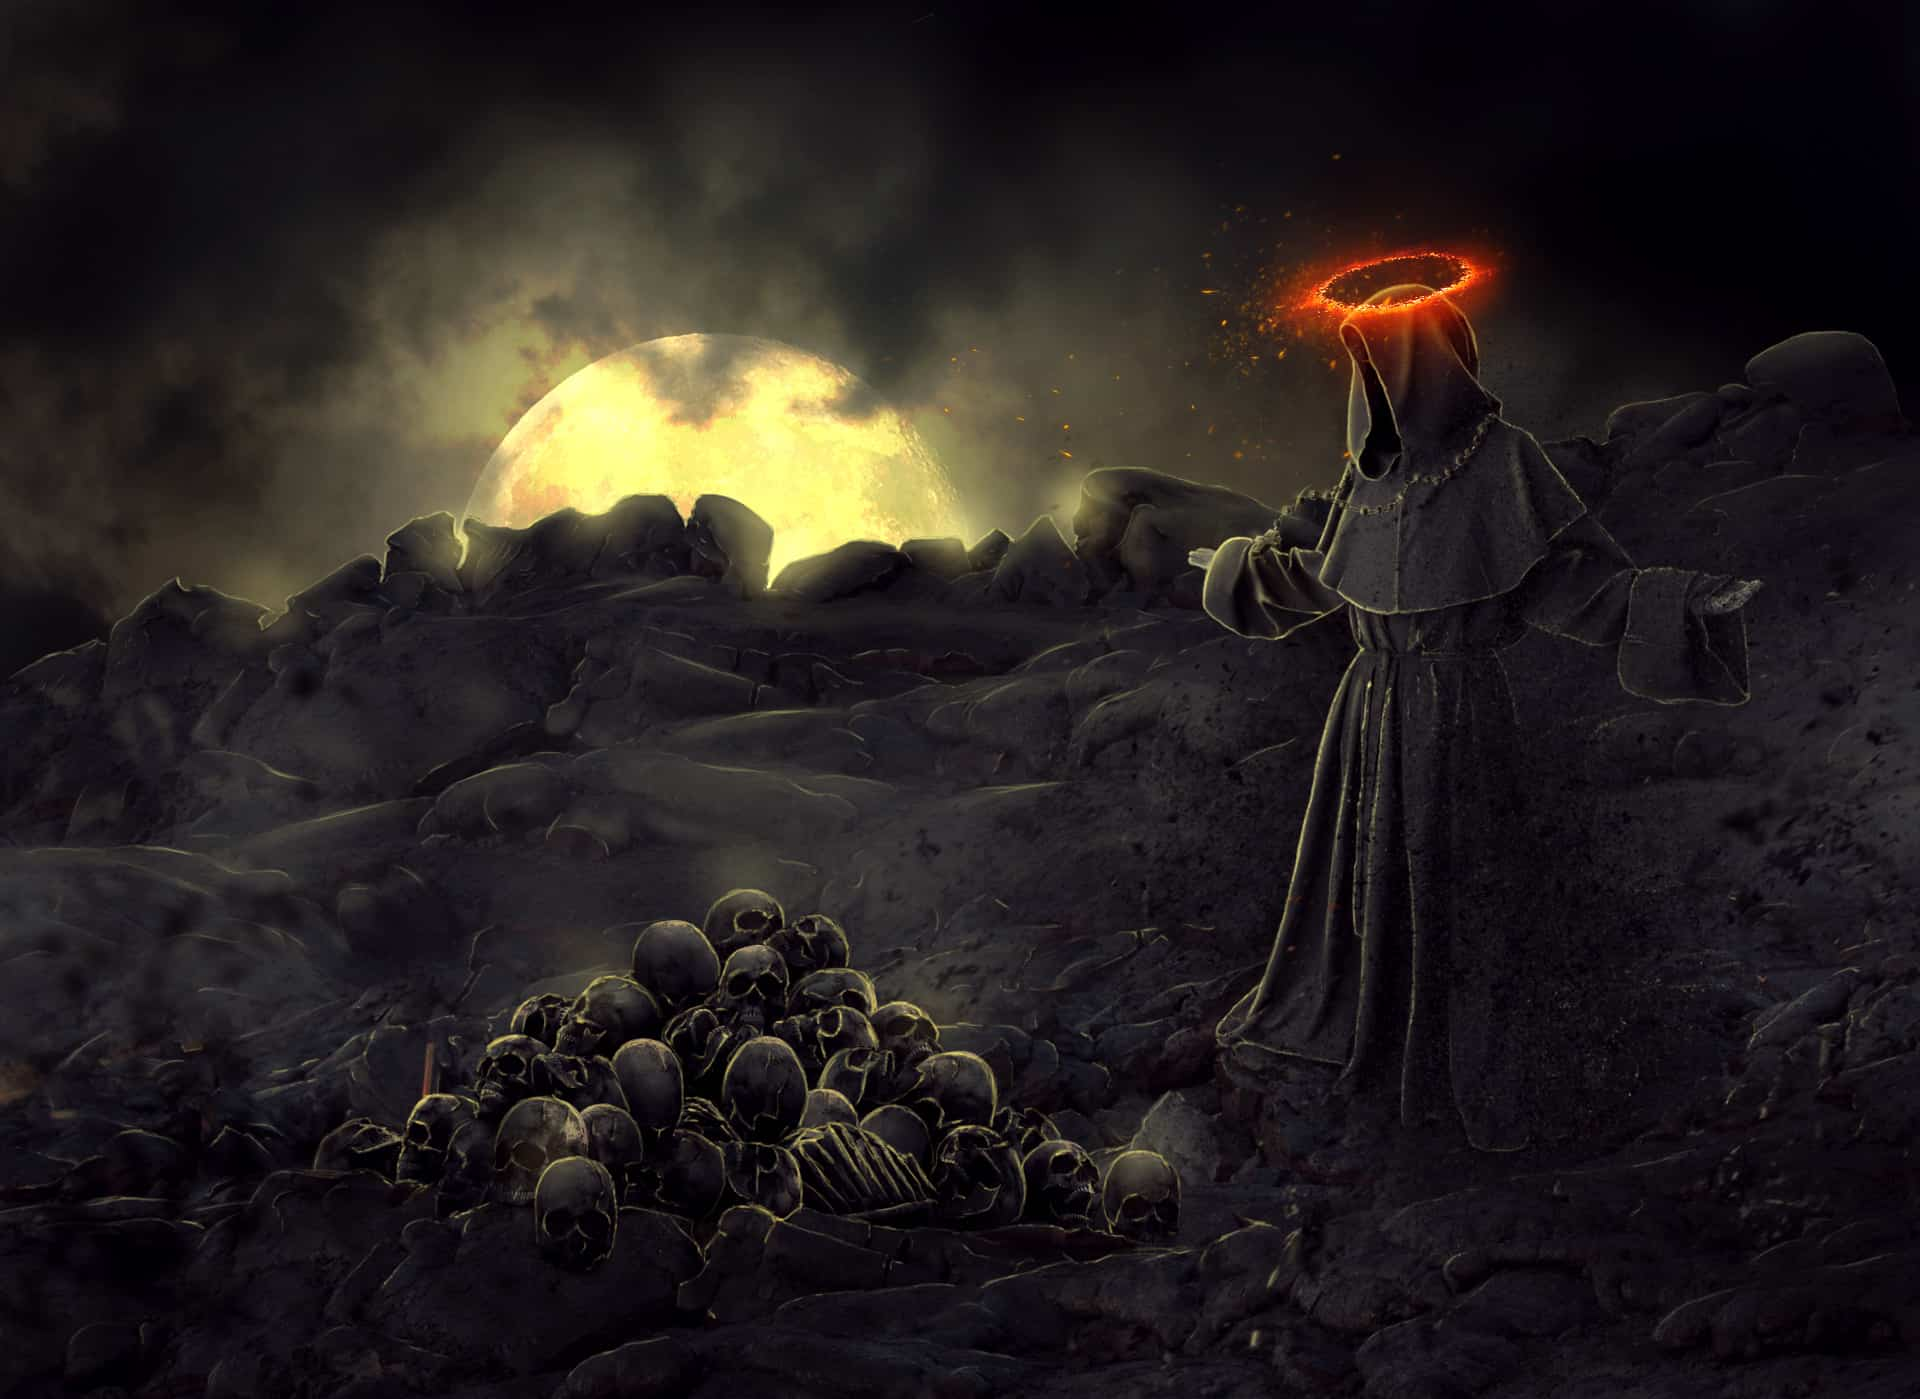 Create a Fantastic Photo Manipulation of a Dark Monk